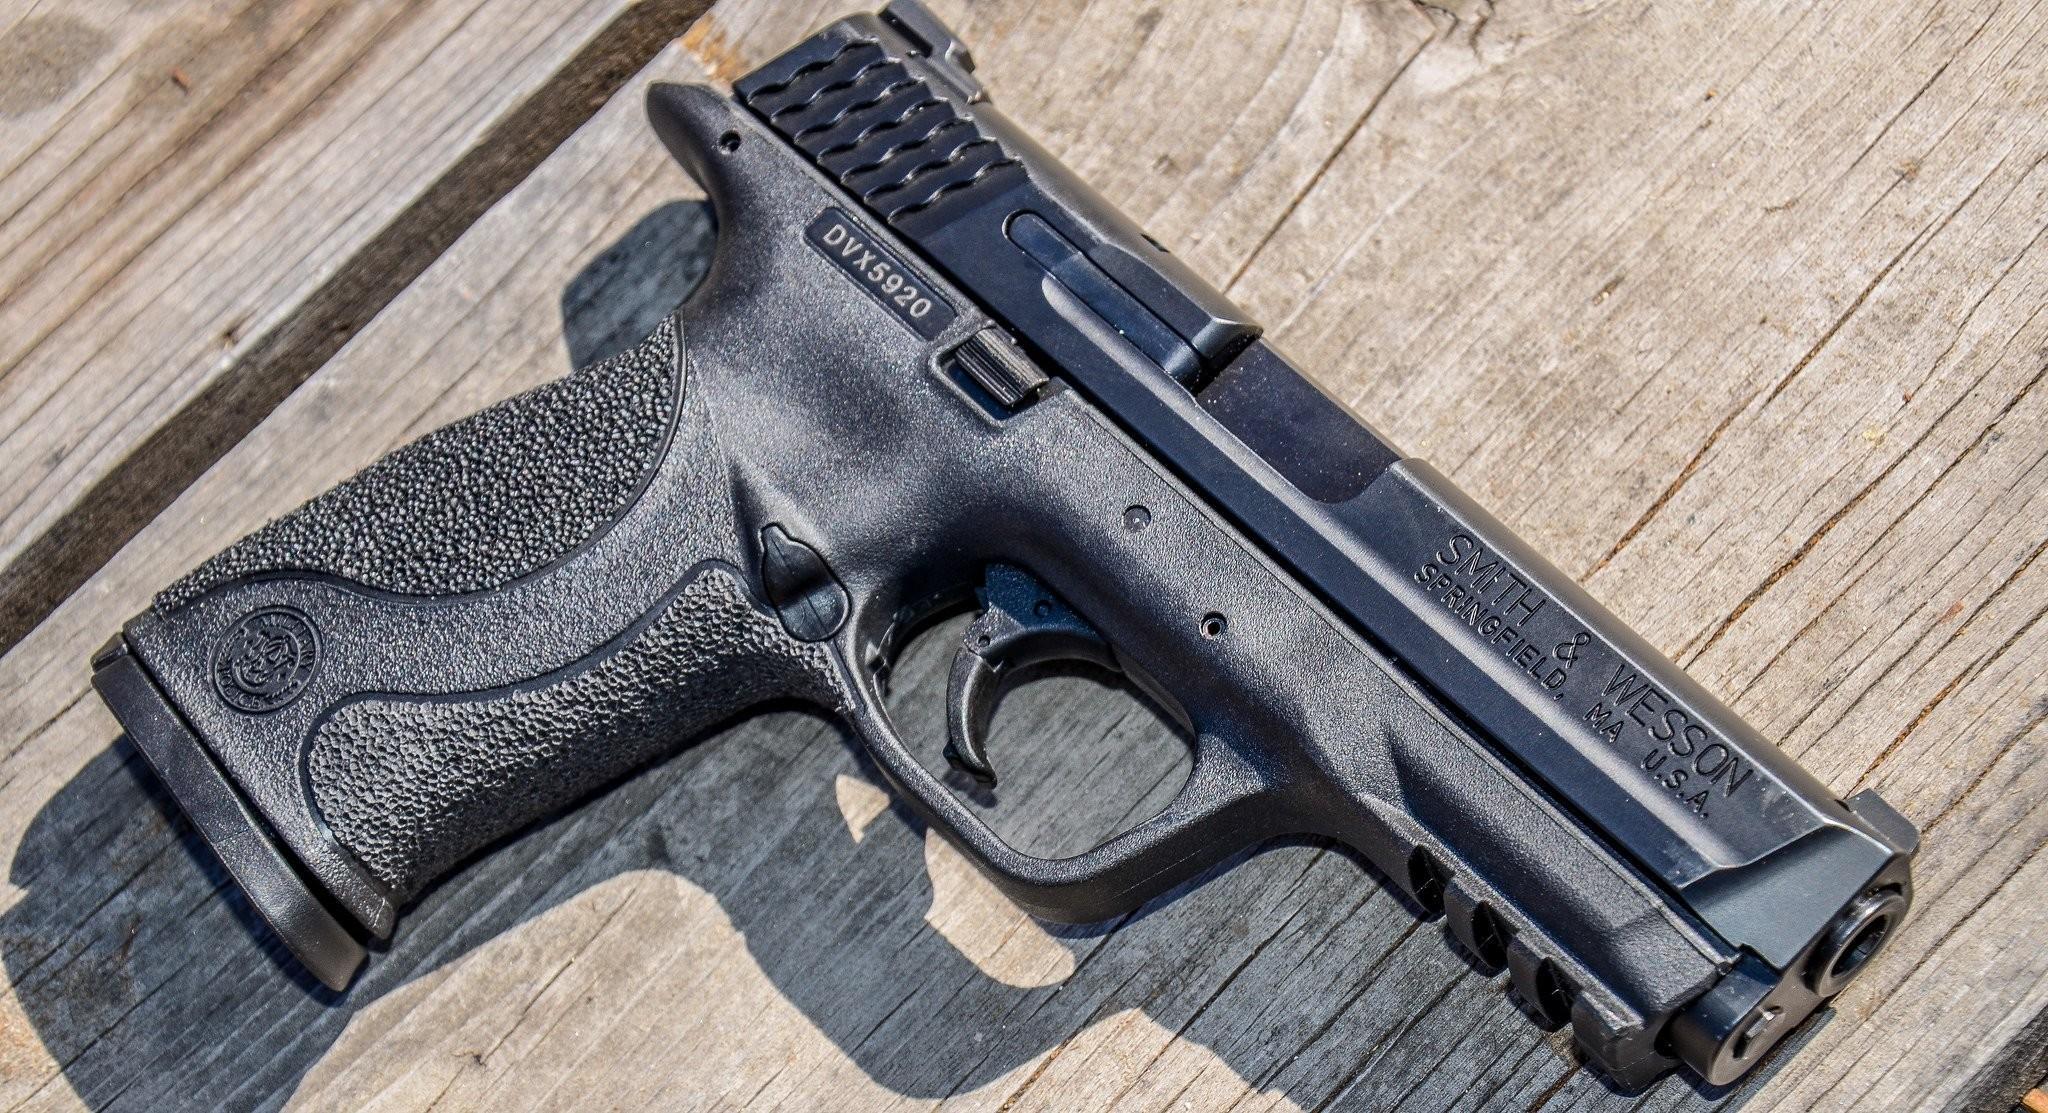 smith & wesson m&p springfield gun weapon background